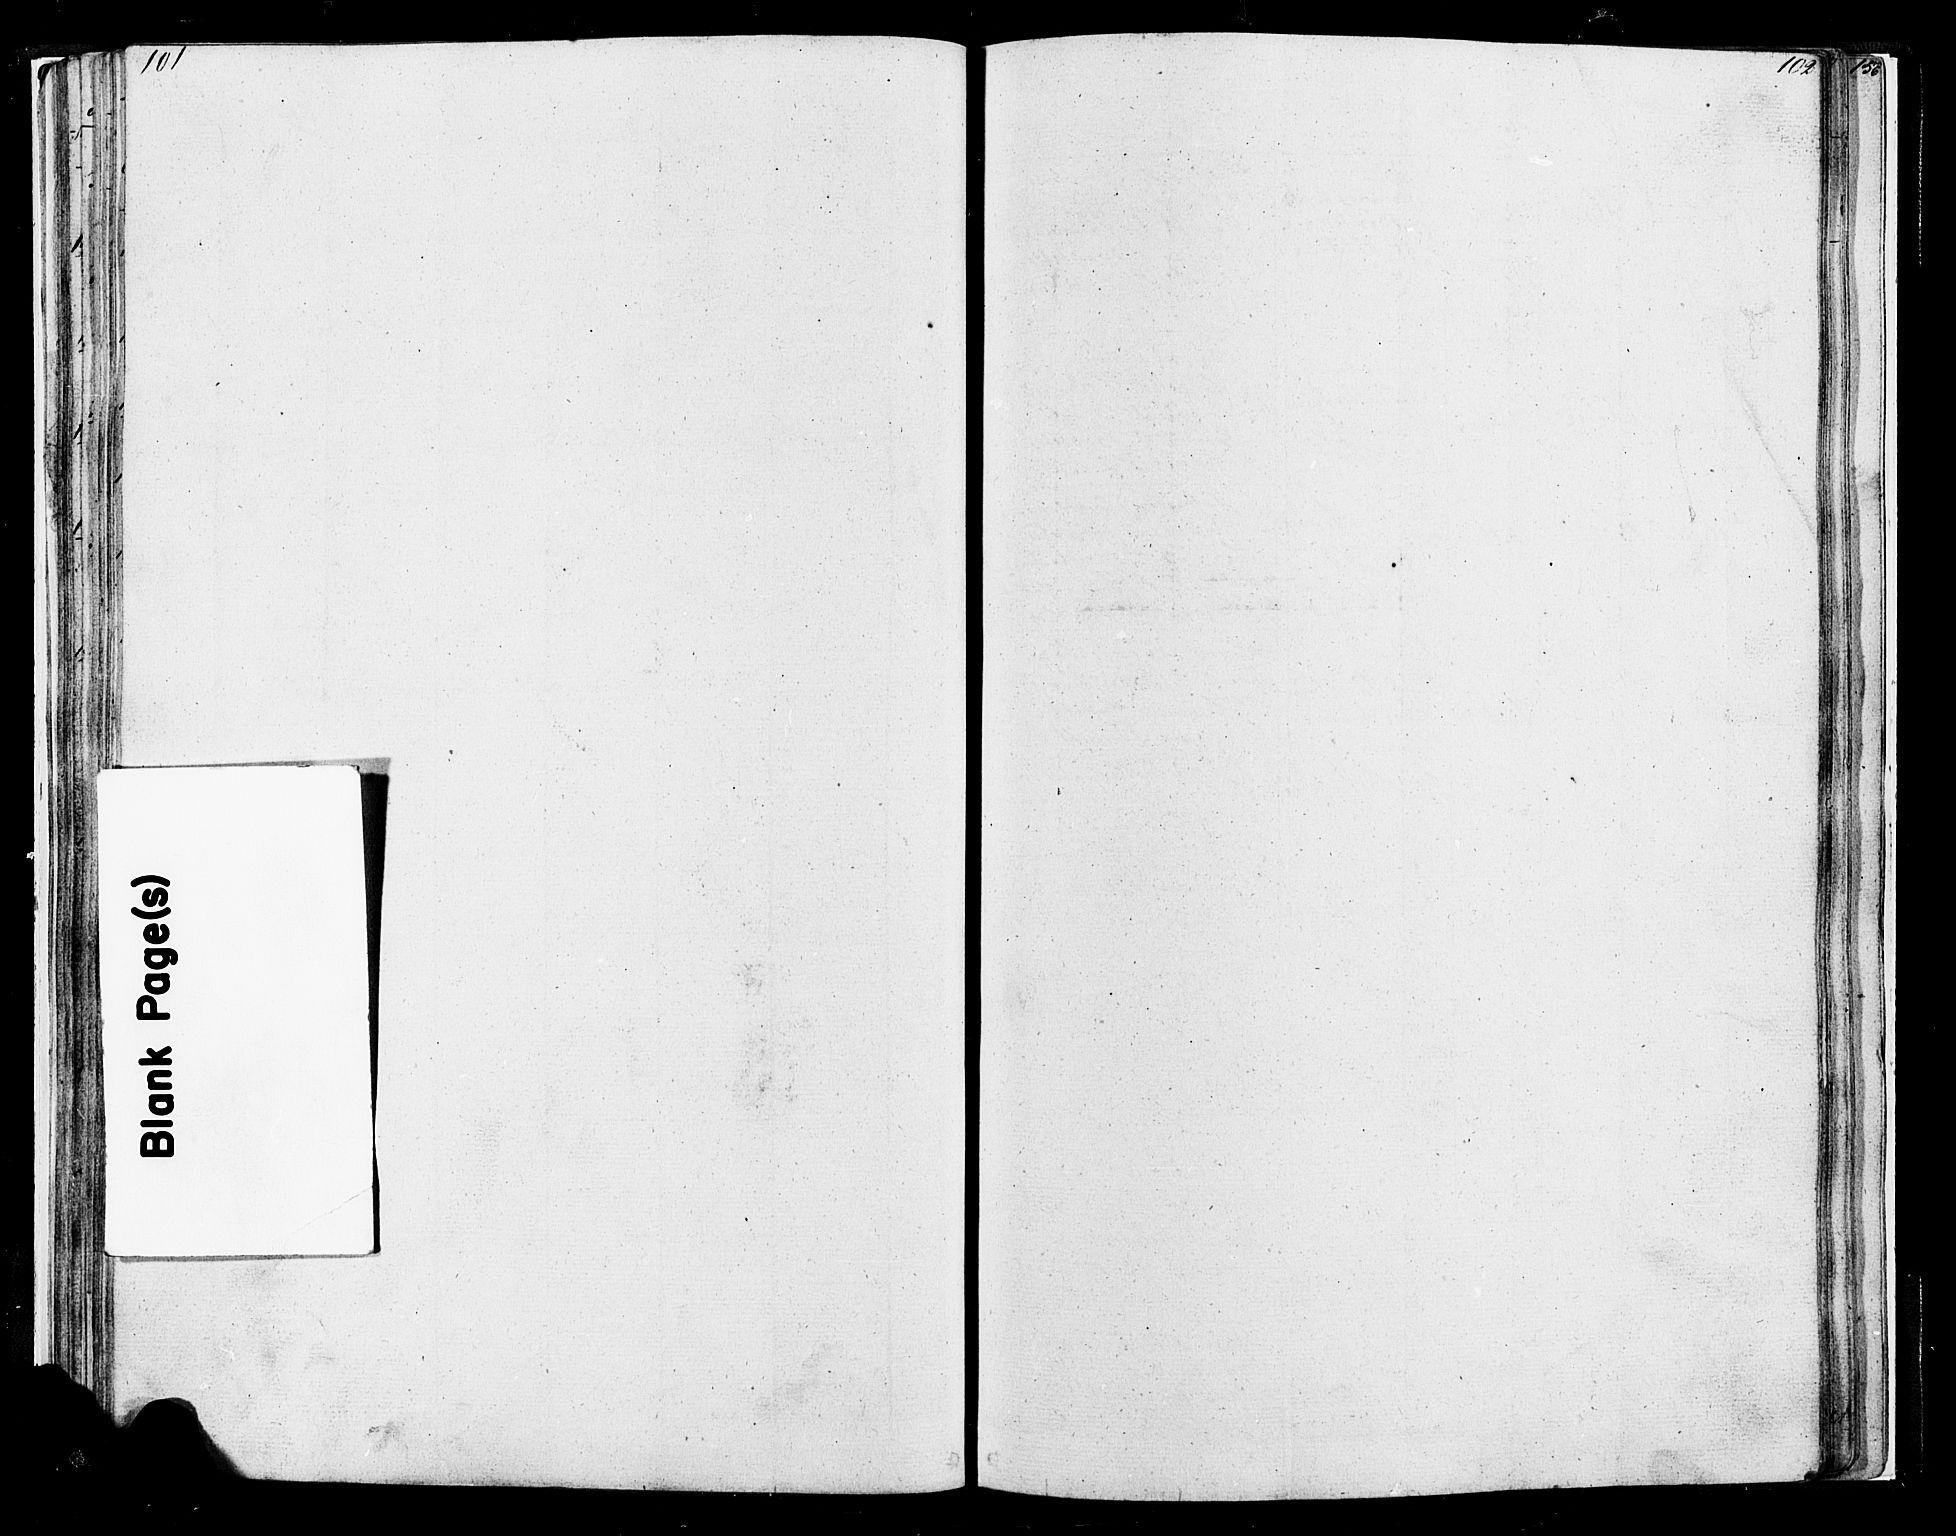 SAH, Lesja prestekontor, Klokkerbok nr. 4, 1842-1871, s. 101-102